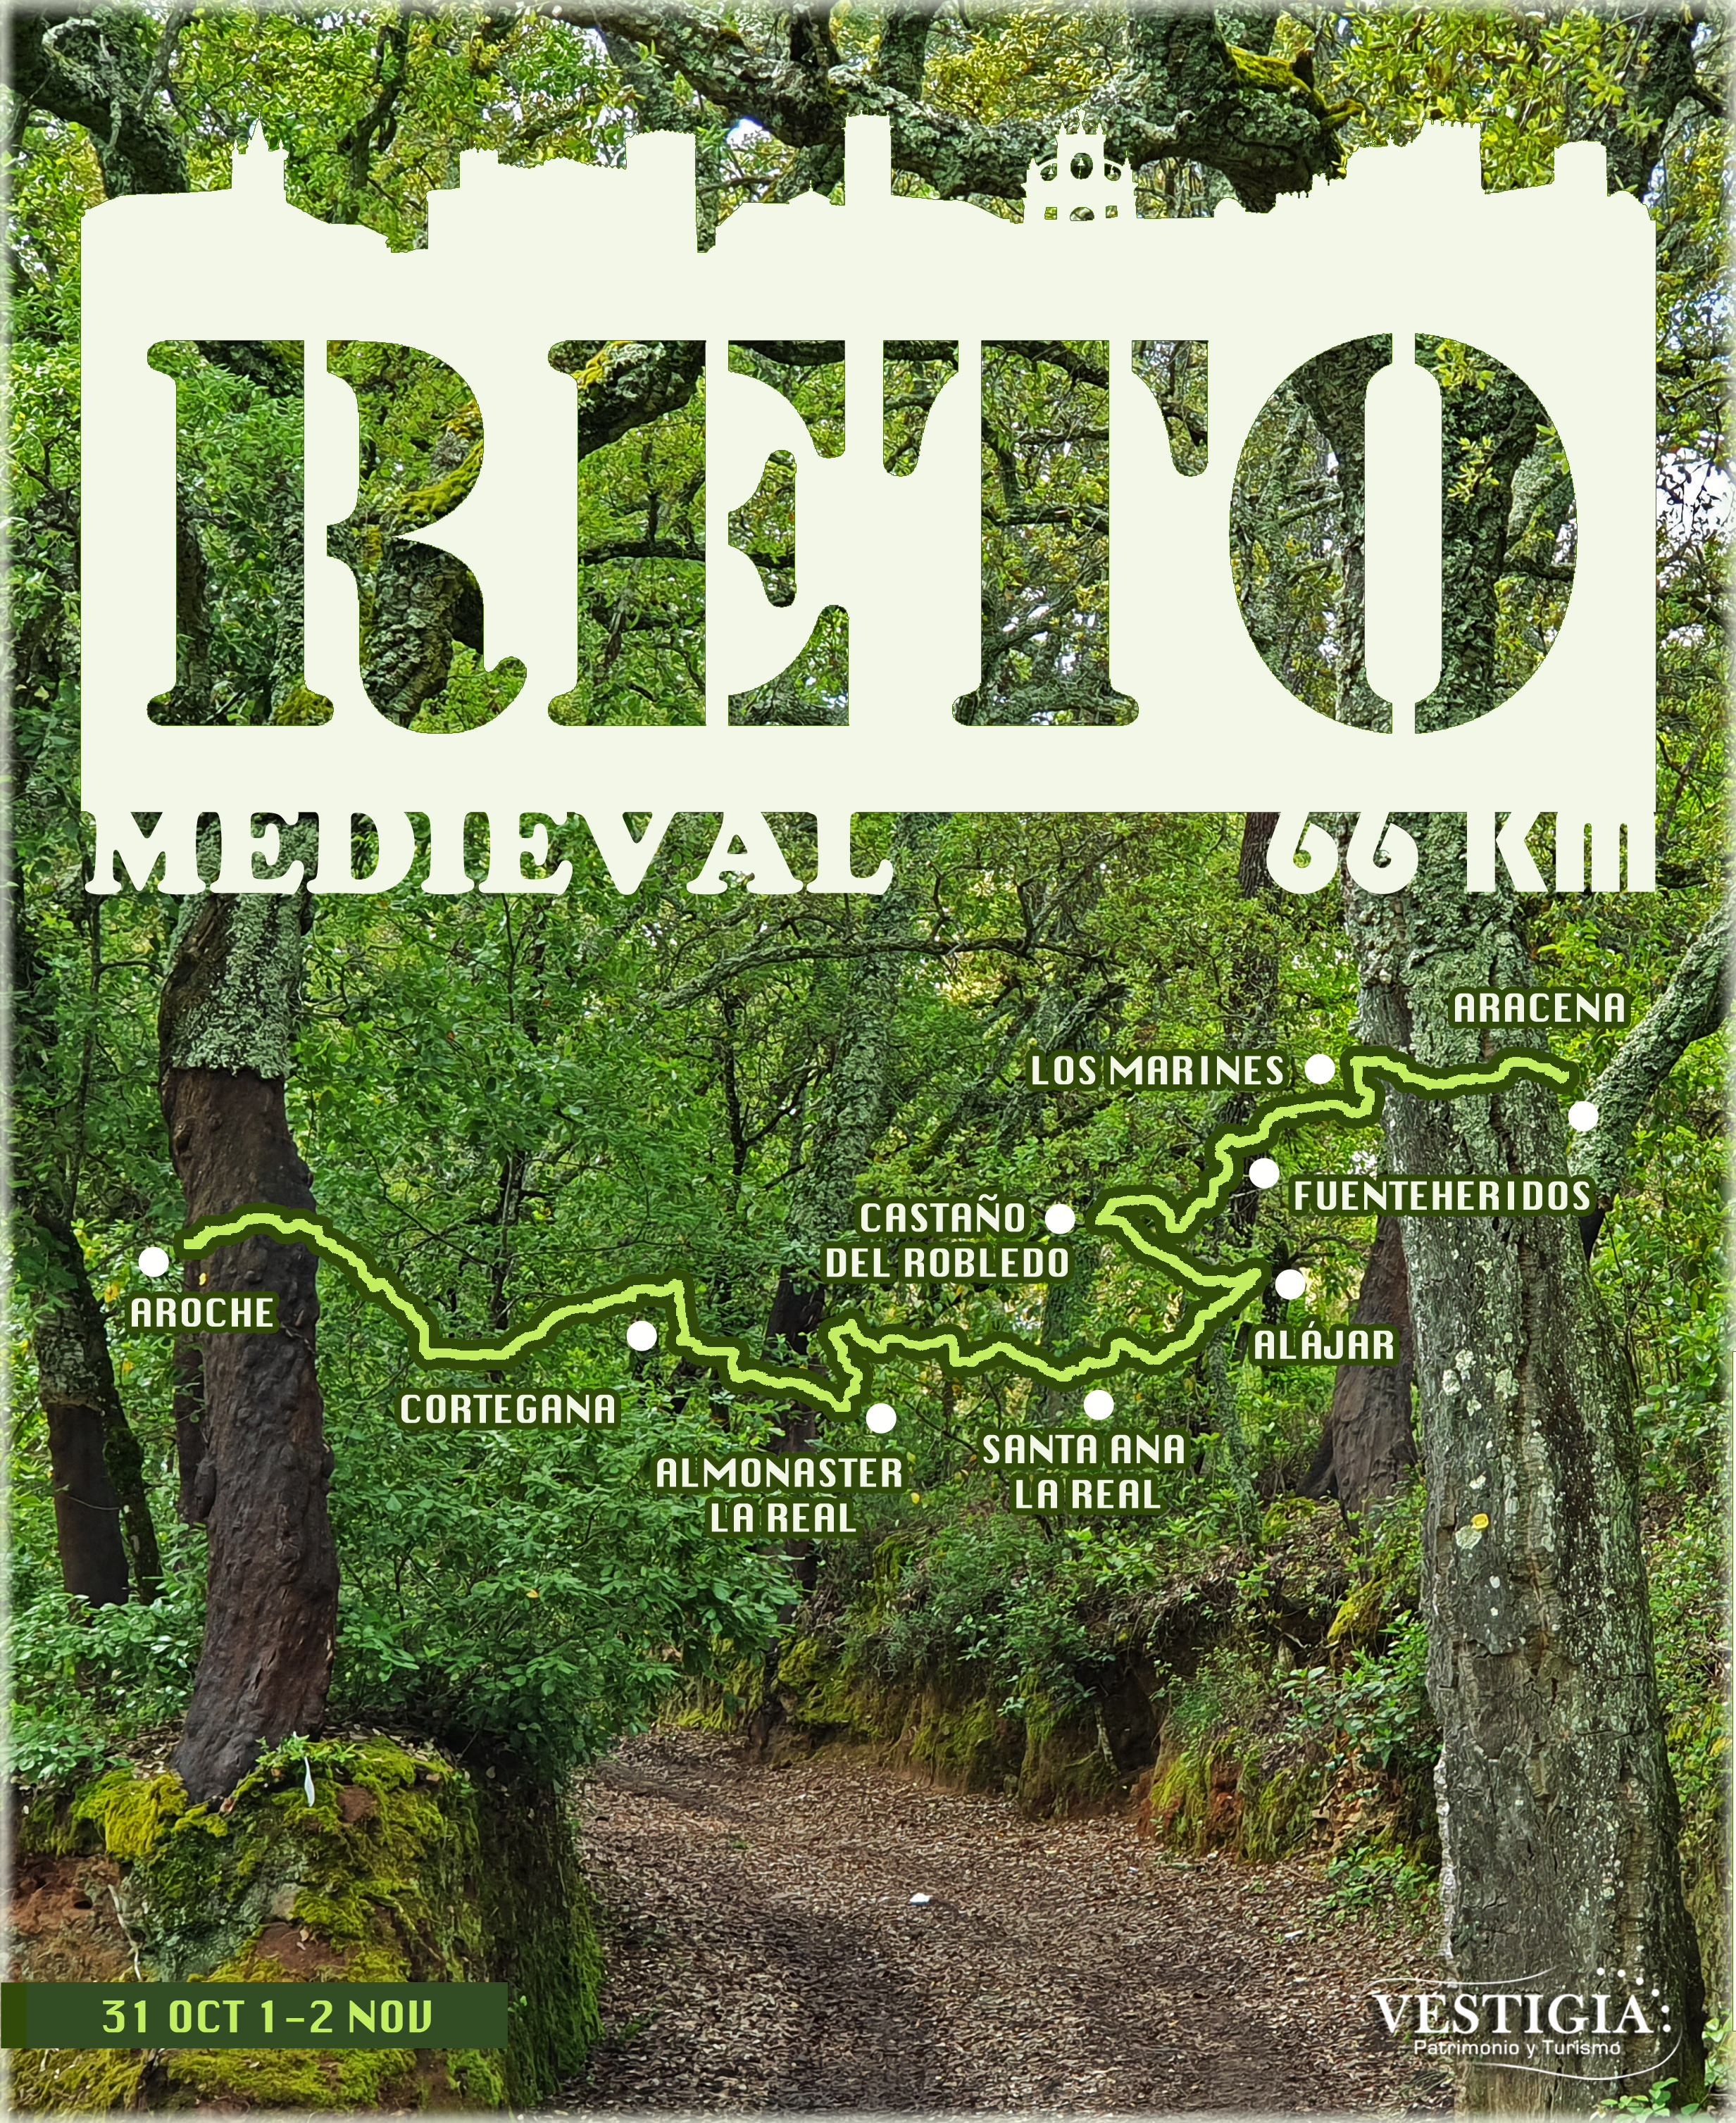 CARTEL RETO OCTUBRE 2020